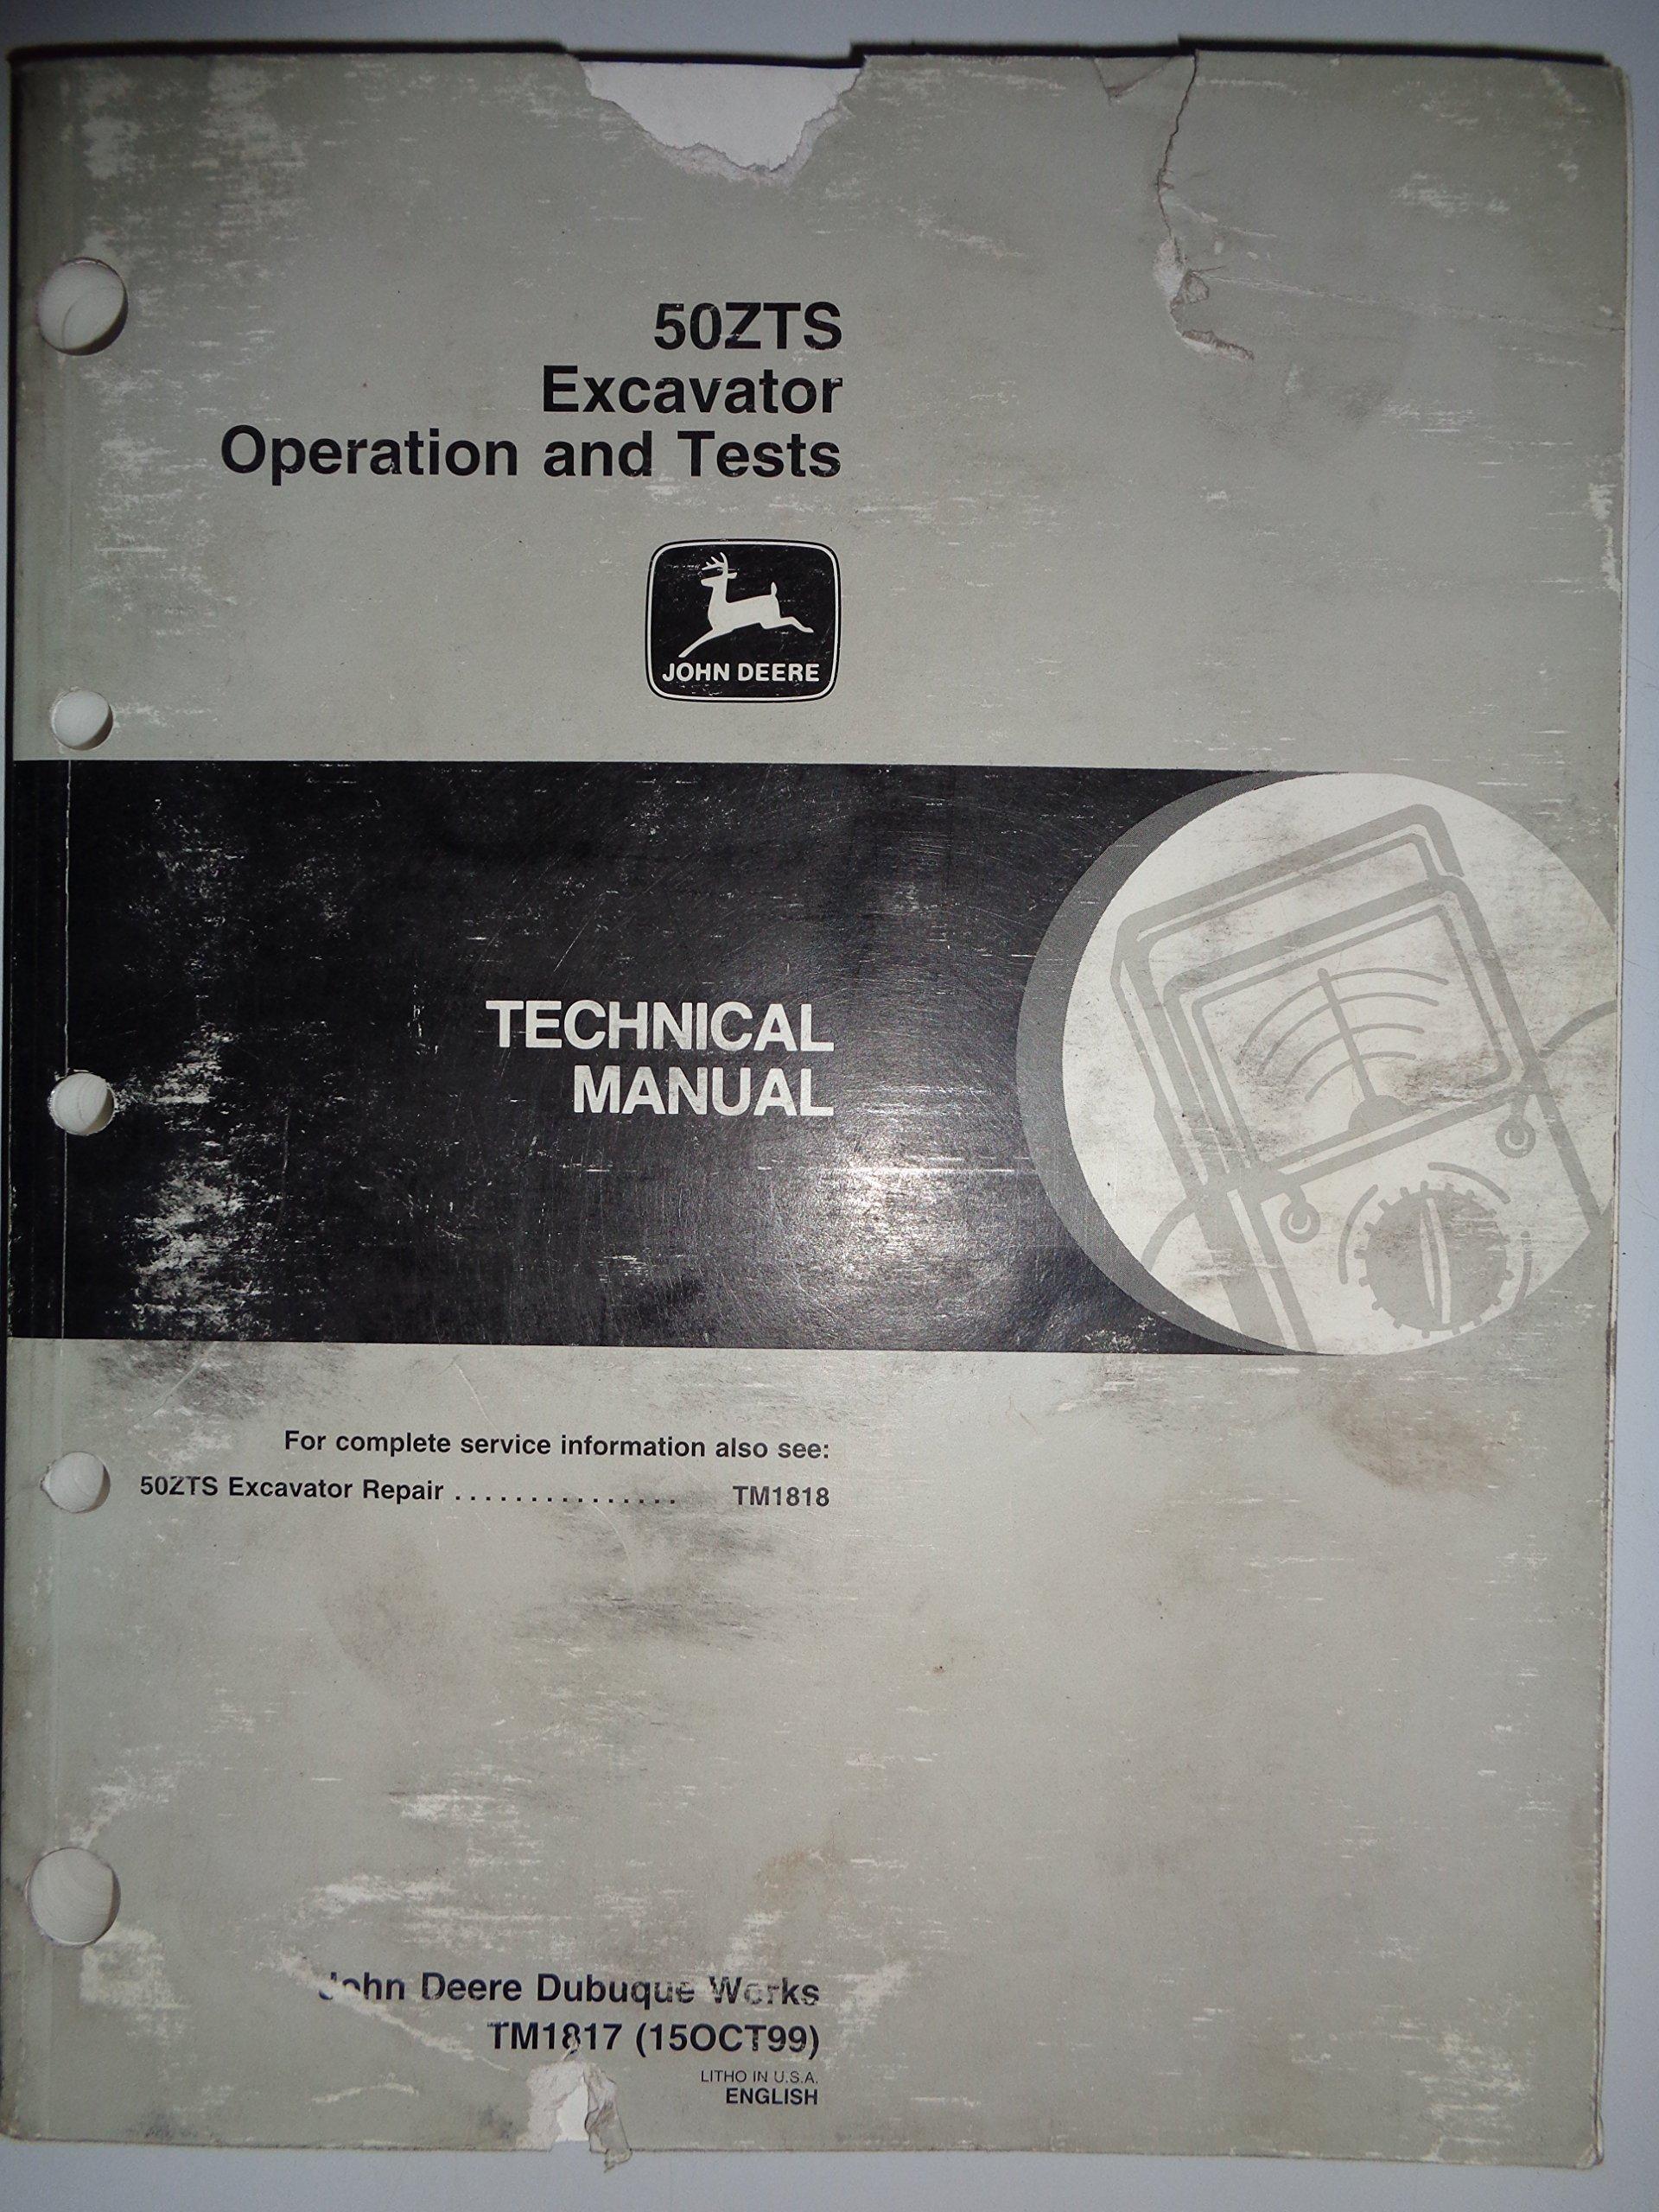 John Deere 50ZTS Excavator OPERATION and TESTS Technical Service Manual  10/99: Deere, John Deere: Amazon.com: Books